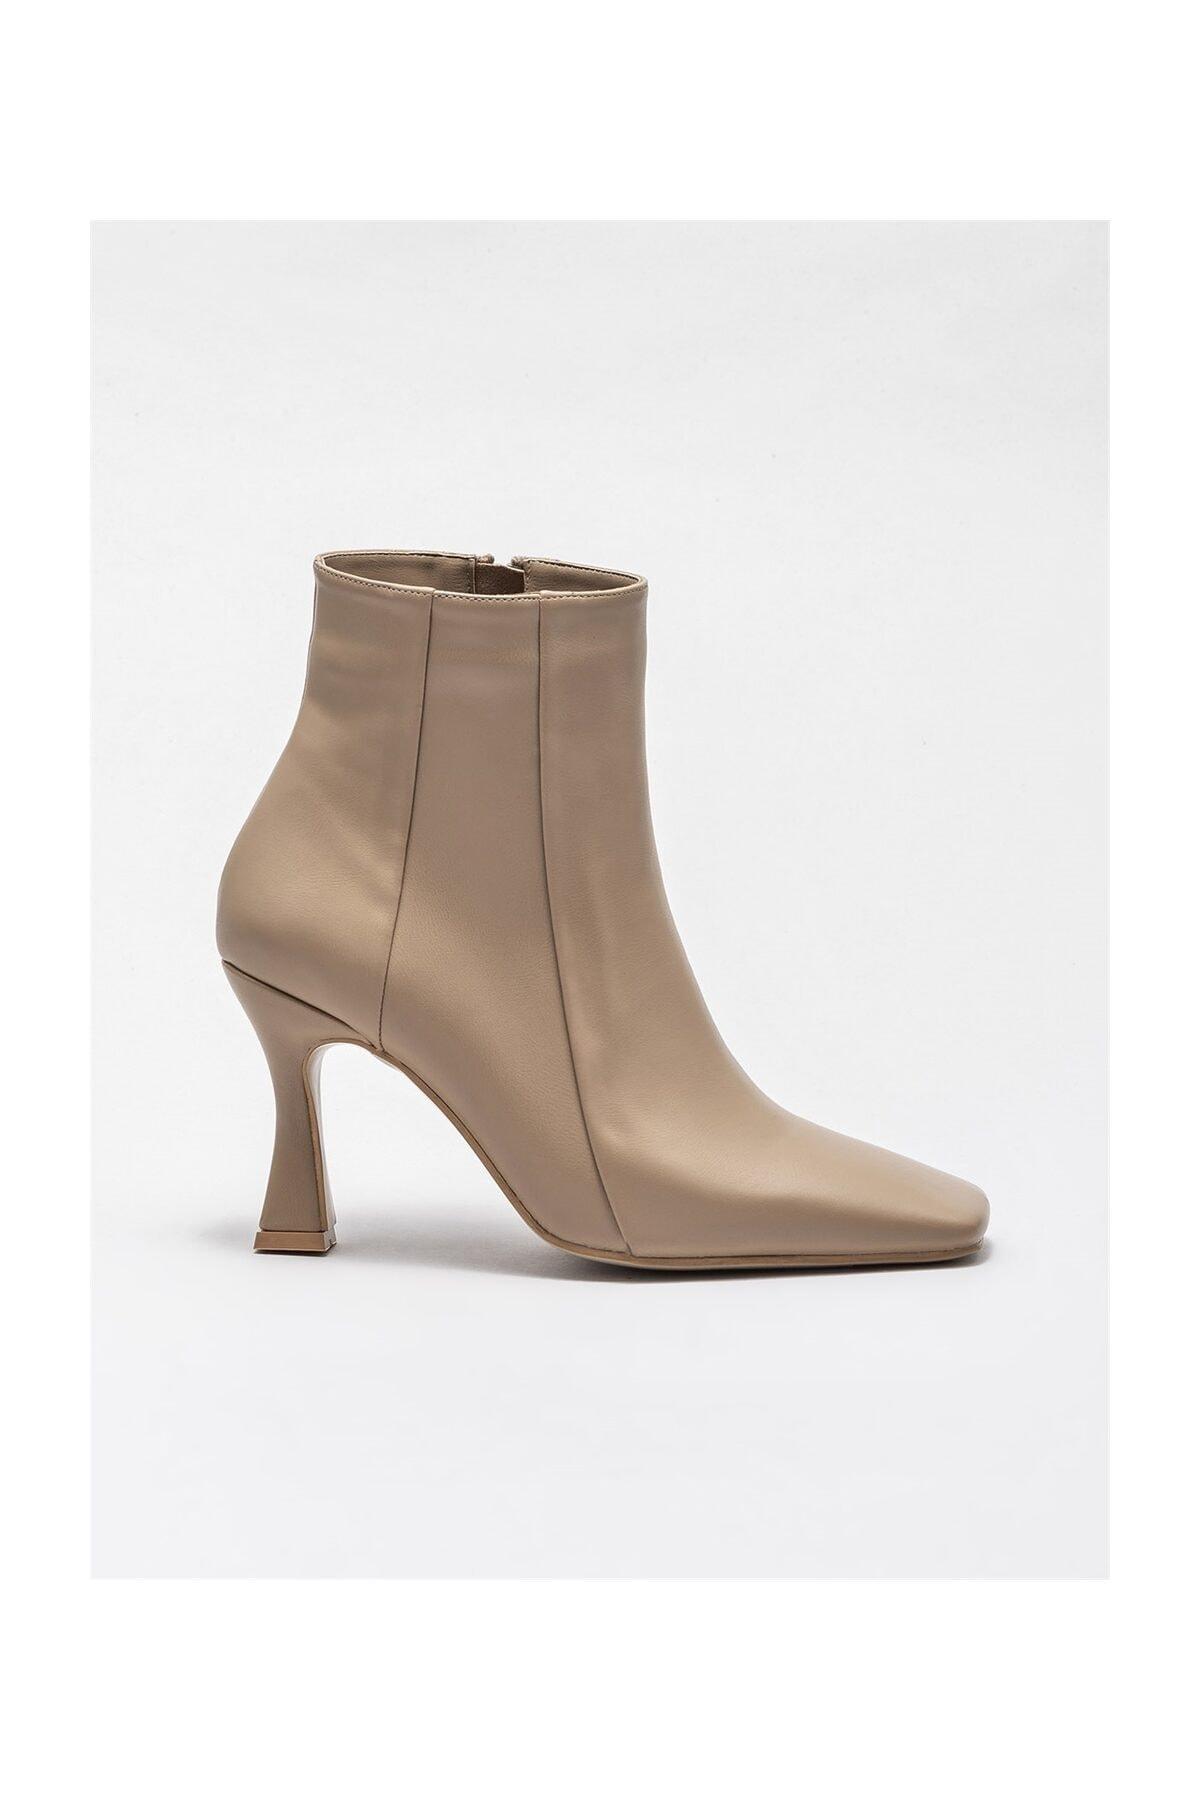 Elle Shoes Bot & Bootie RONSONAS 20KSM815 1